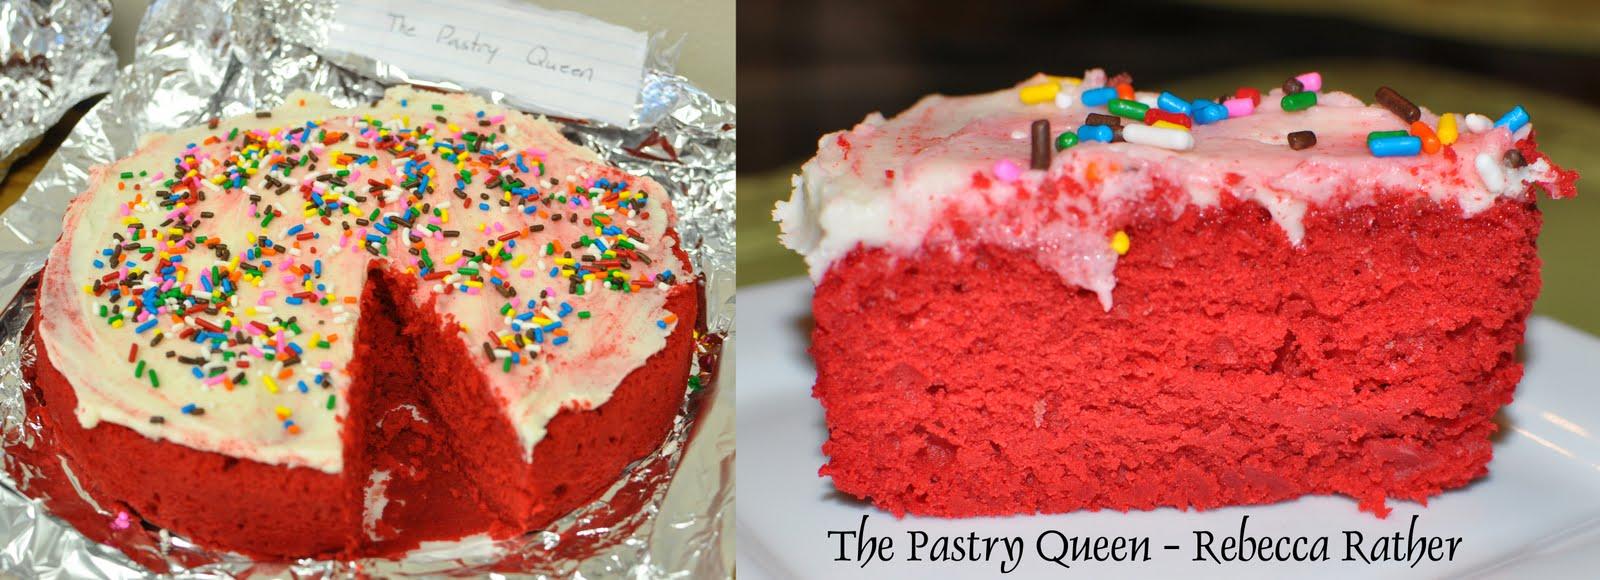 Red Velvet Cake Pastry Queen